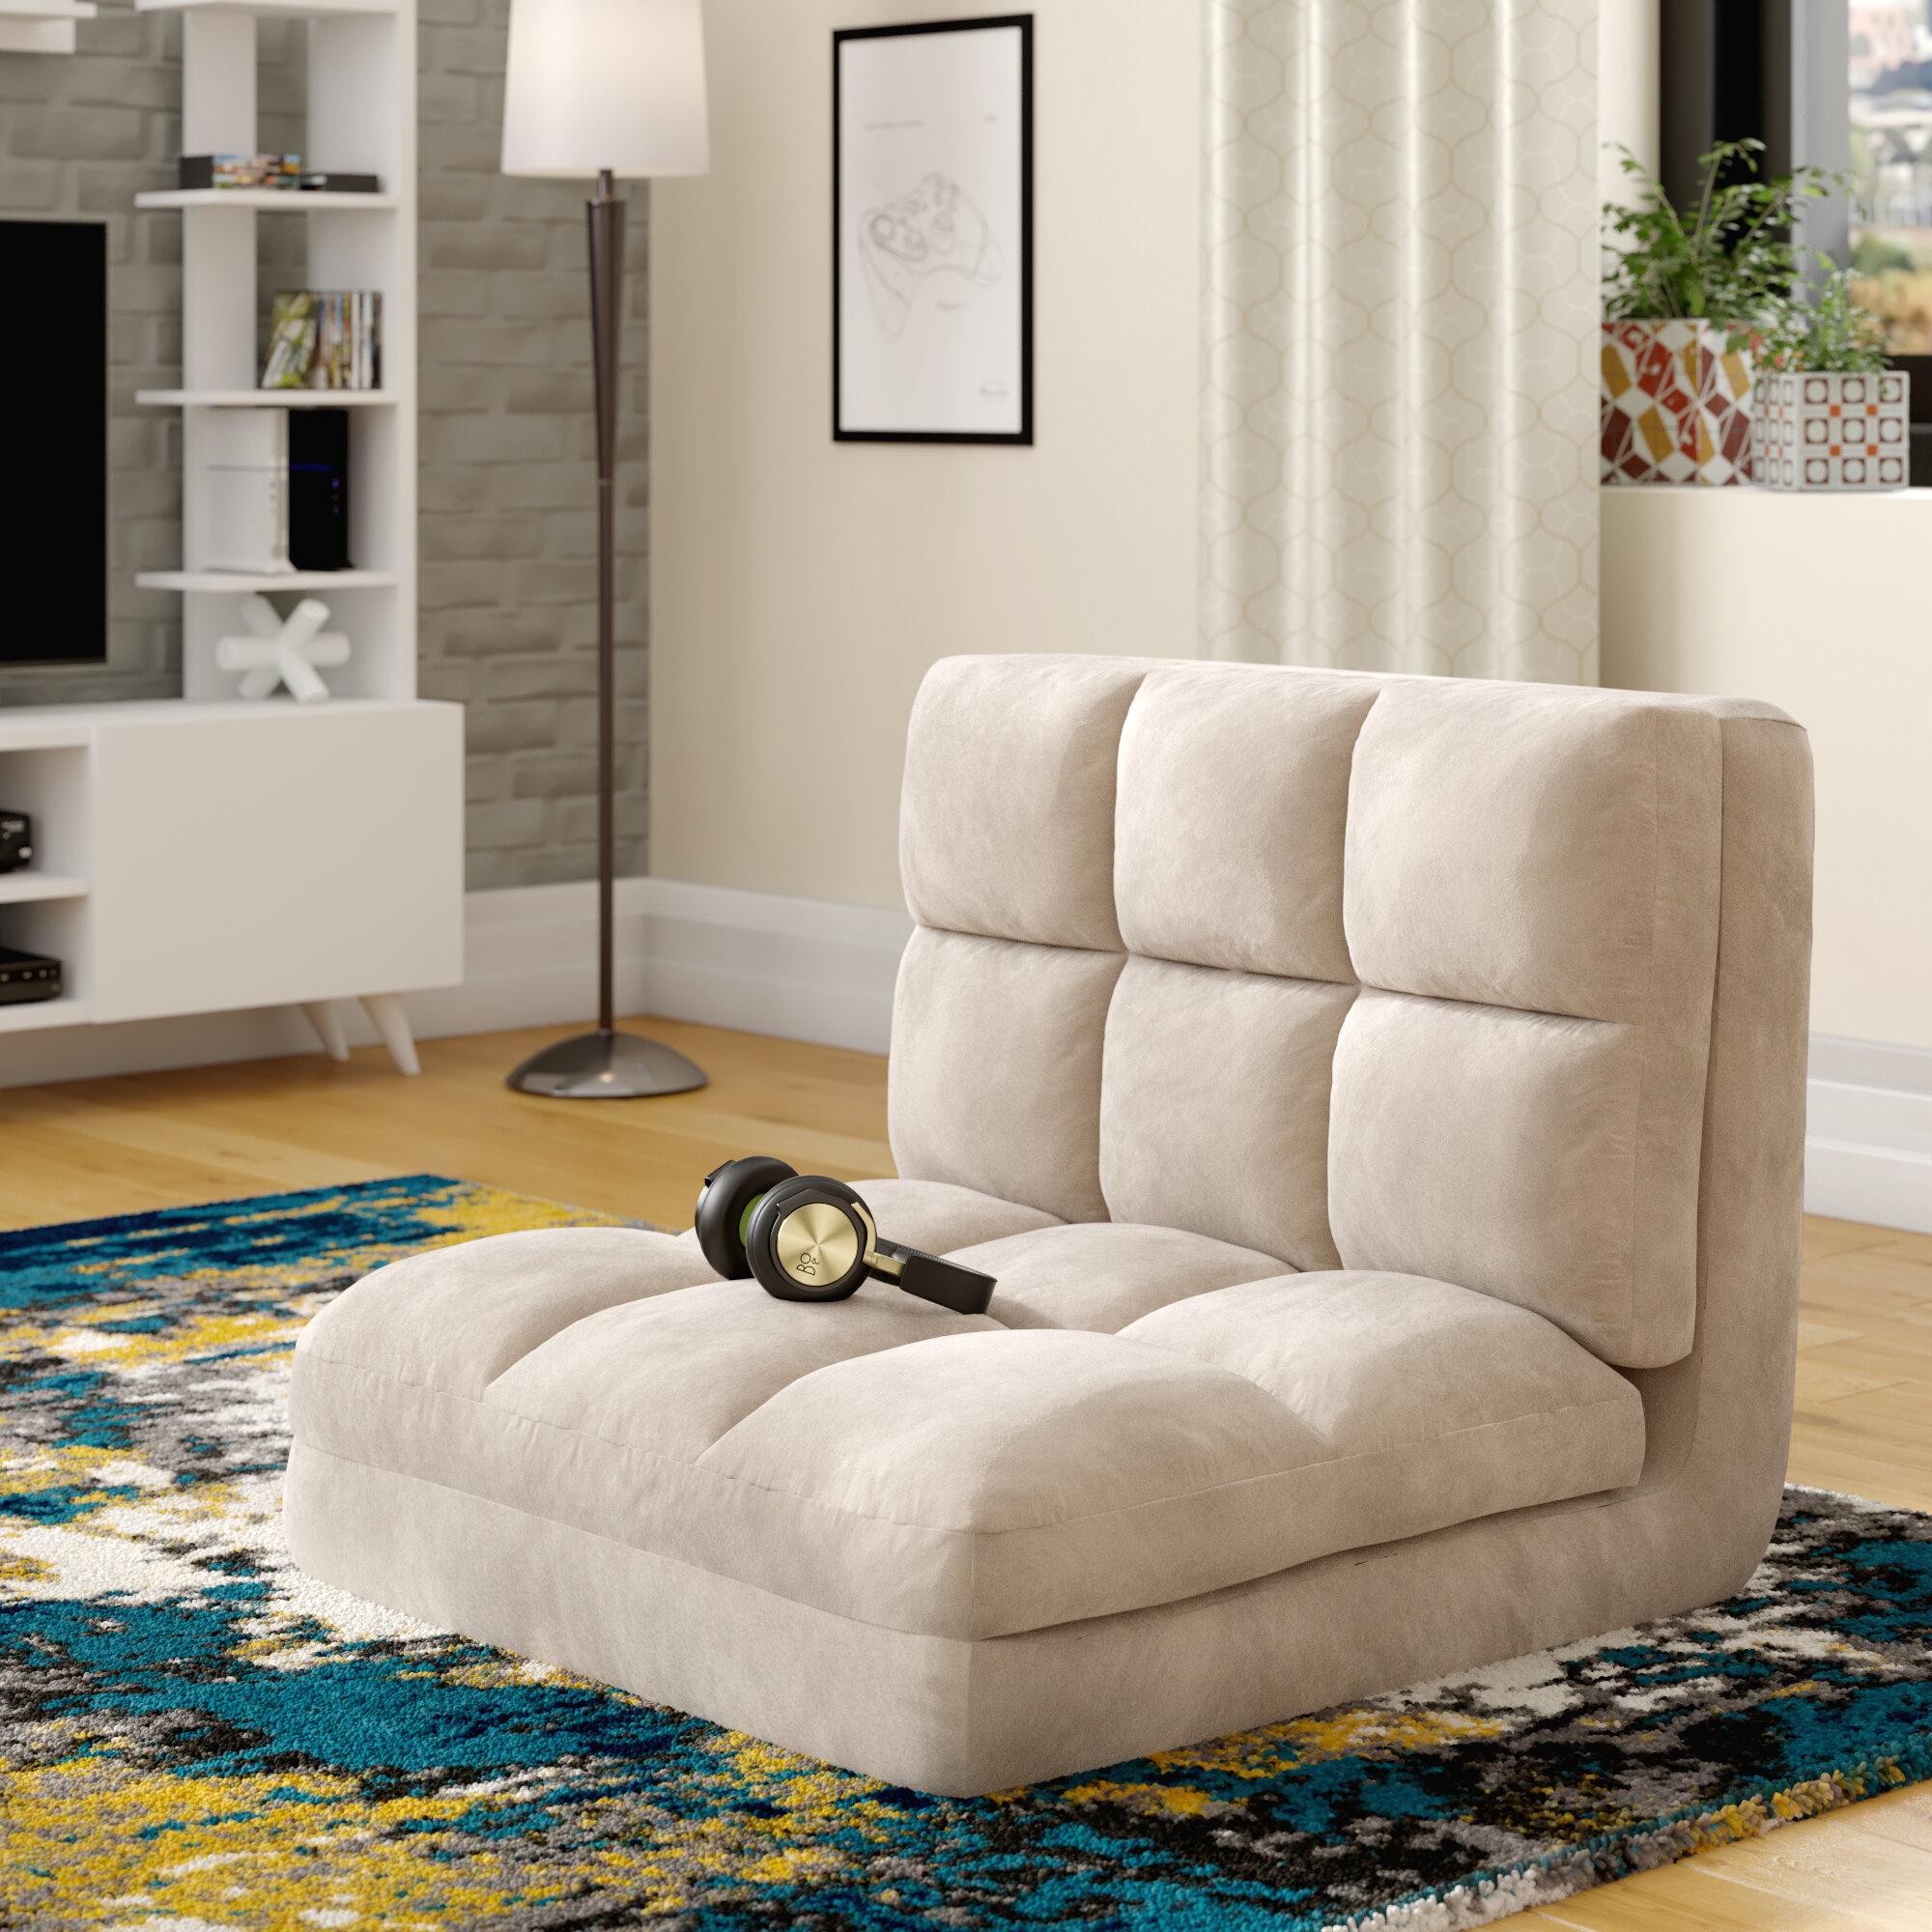 Micro Suede 5 Position Adjustable Convertible Flip Floor Game Chair